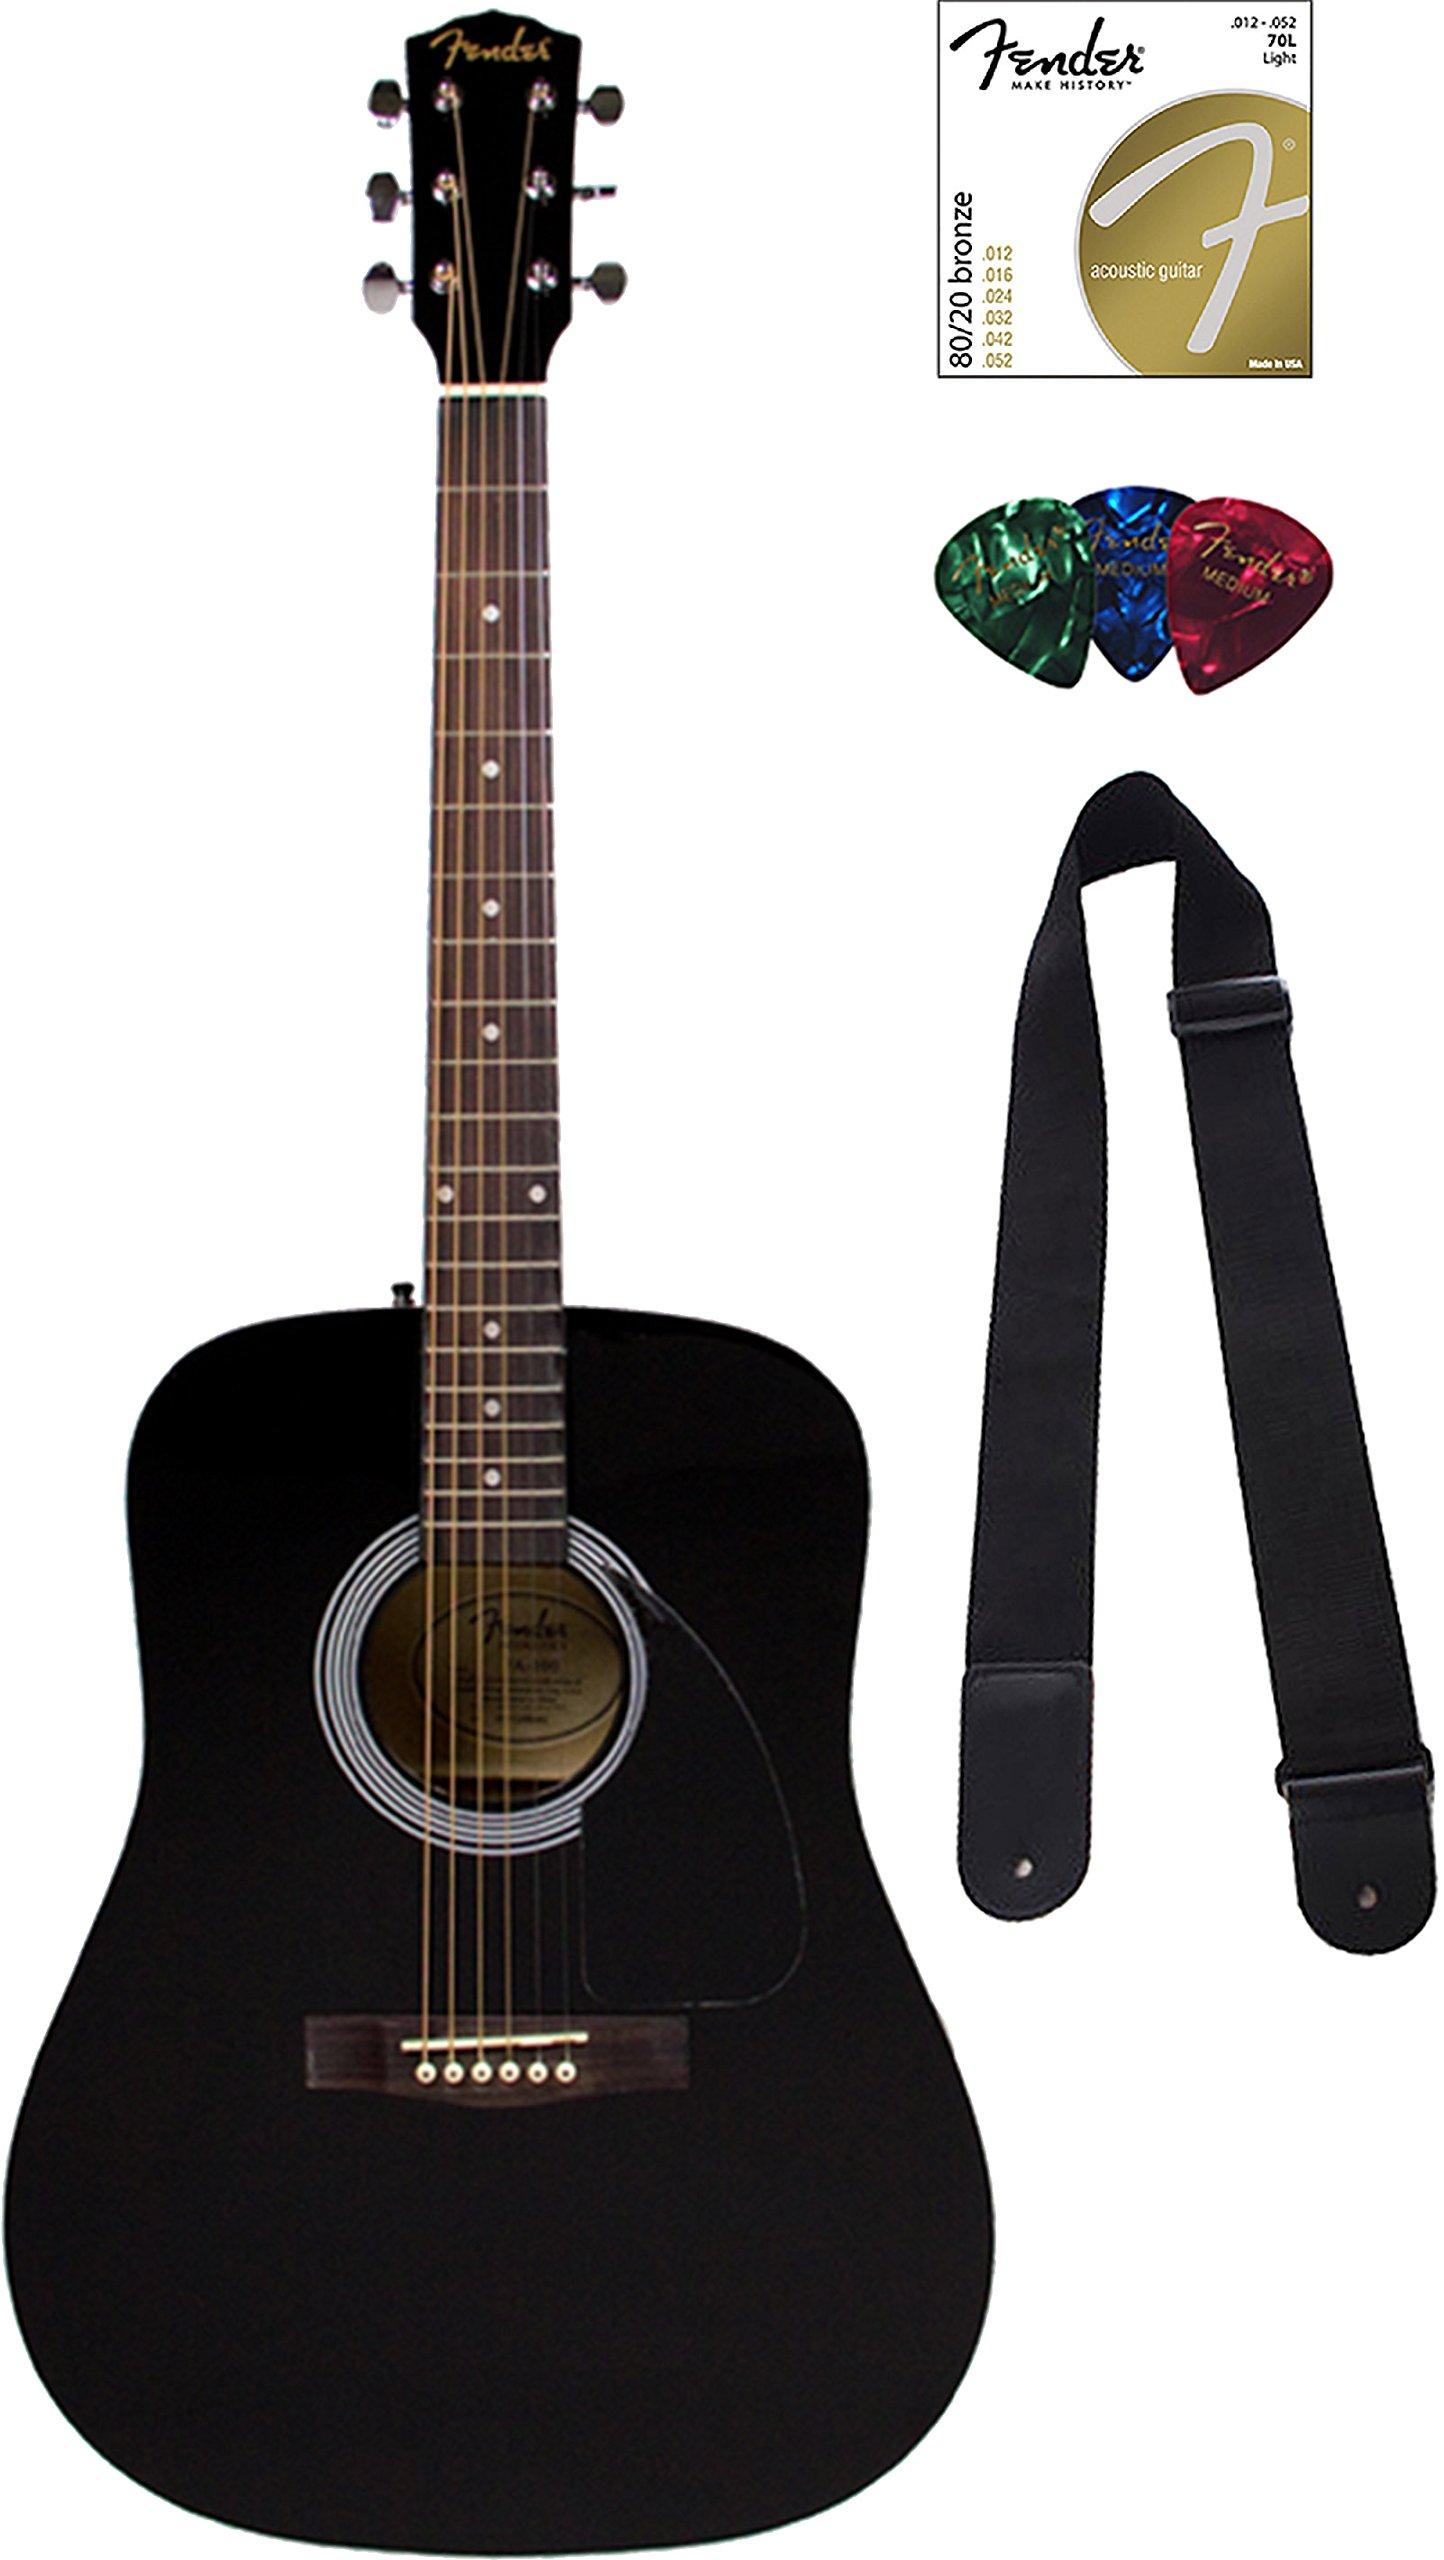 Fender FA-115 Dreadnought Acoustic Guitar - Black by Fender